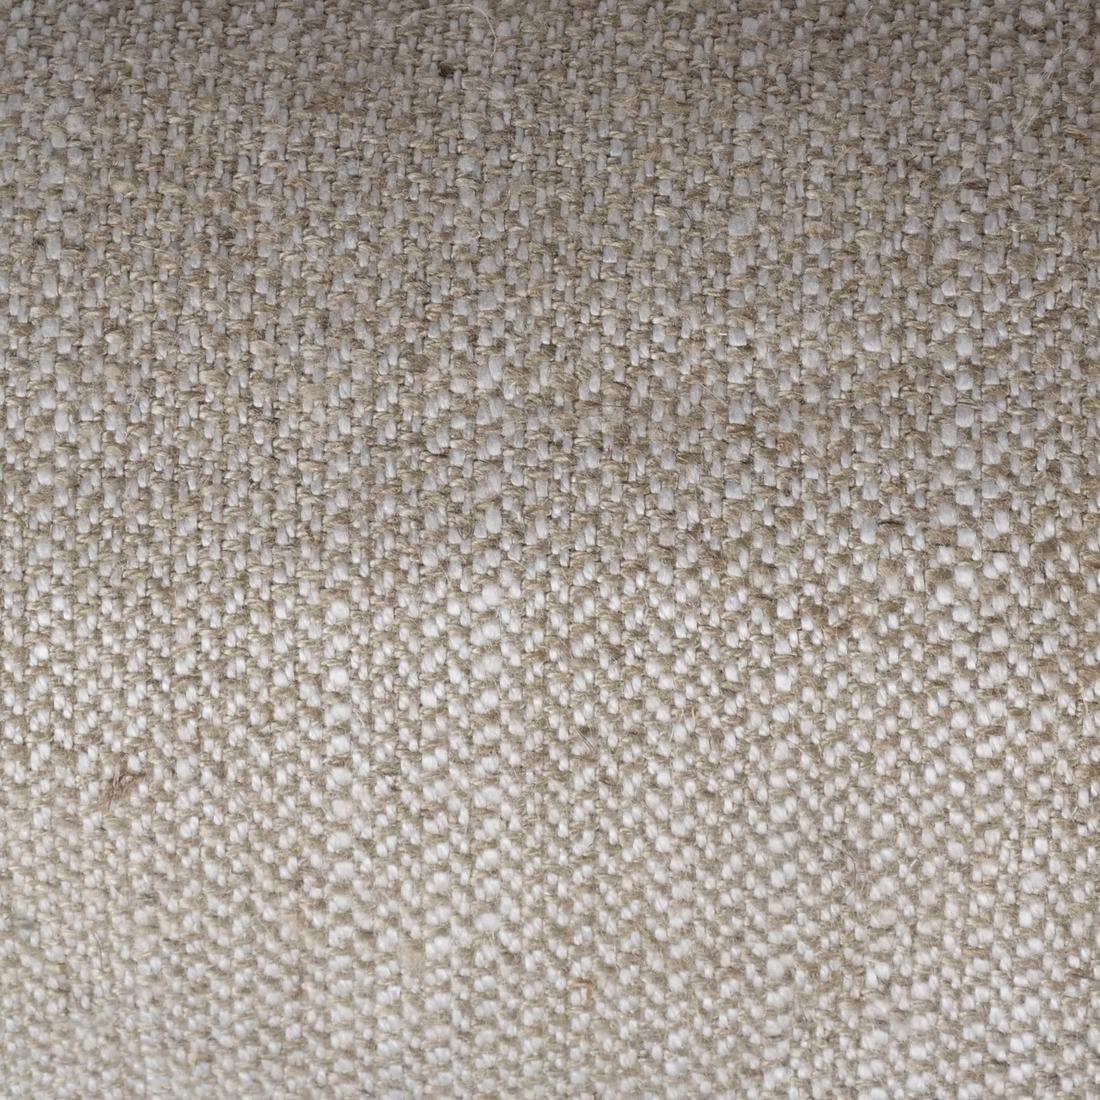 Cowtan & Tout, Zoffany, Allen - Fabrics - 3